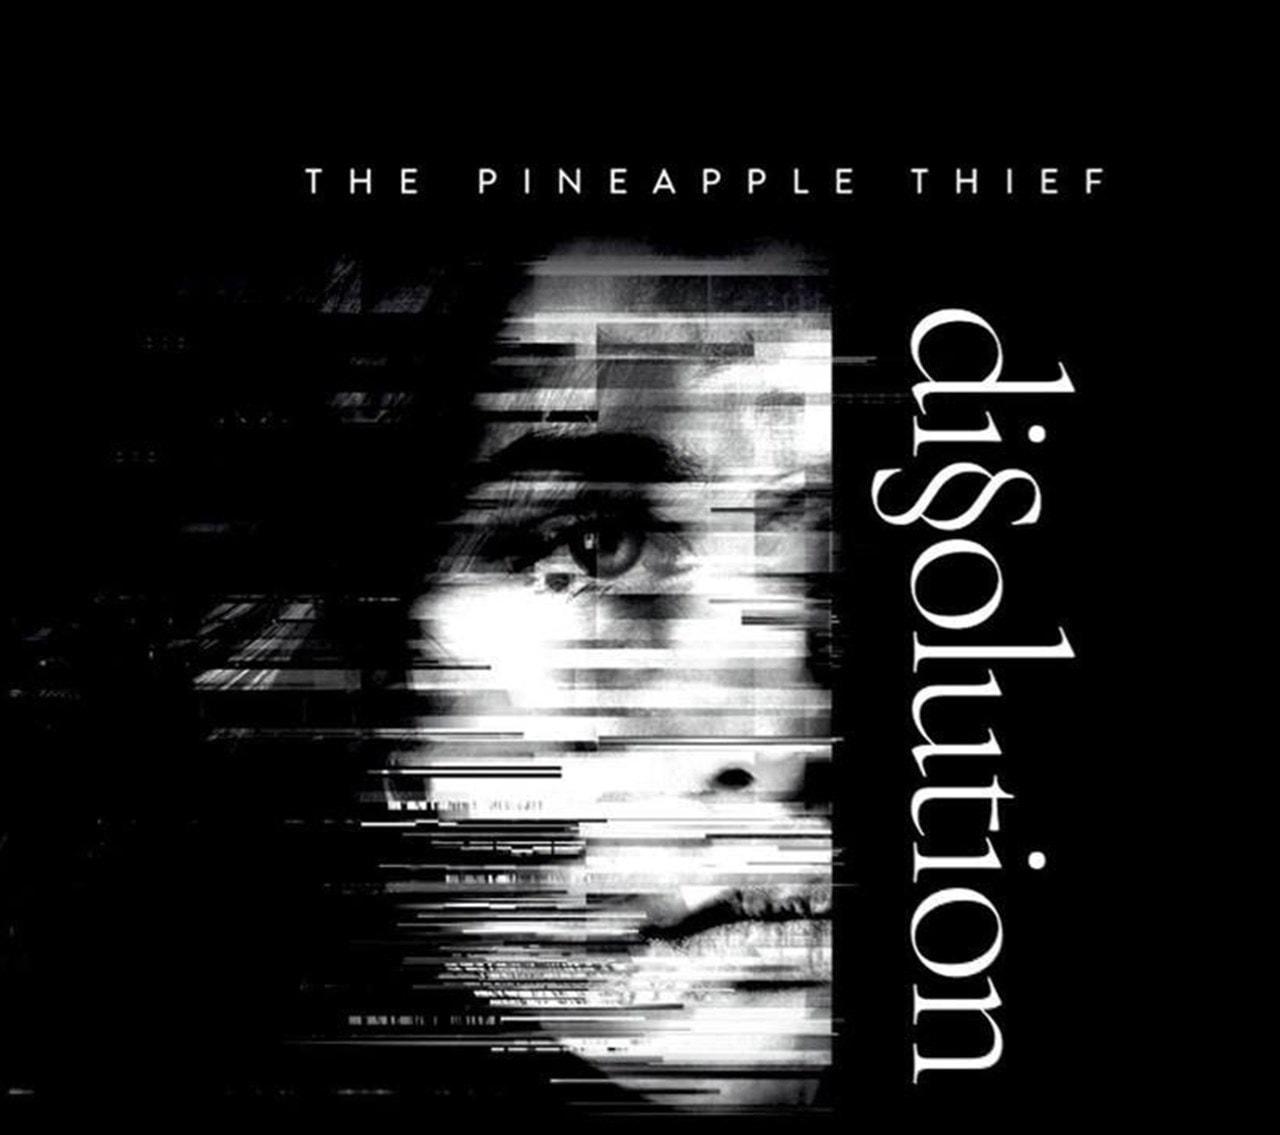 Dissolution - 1